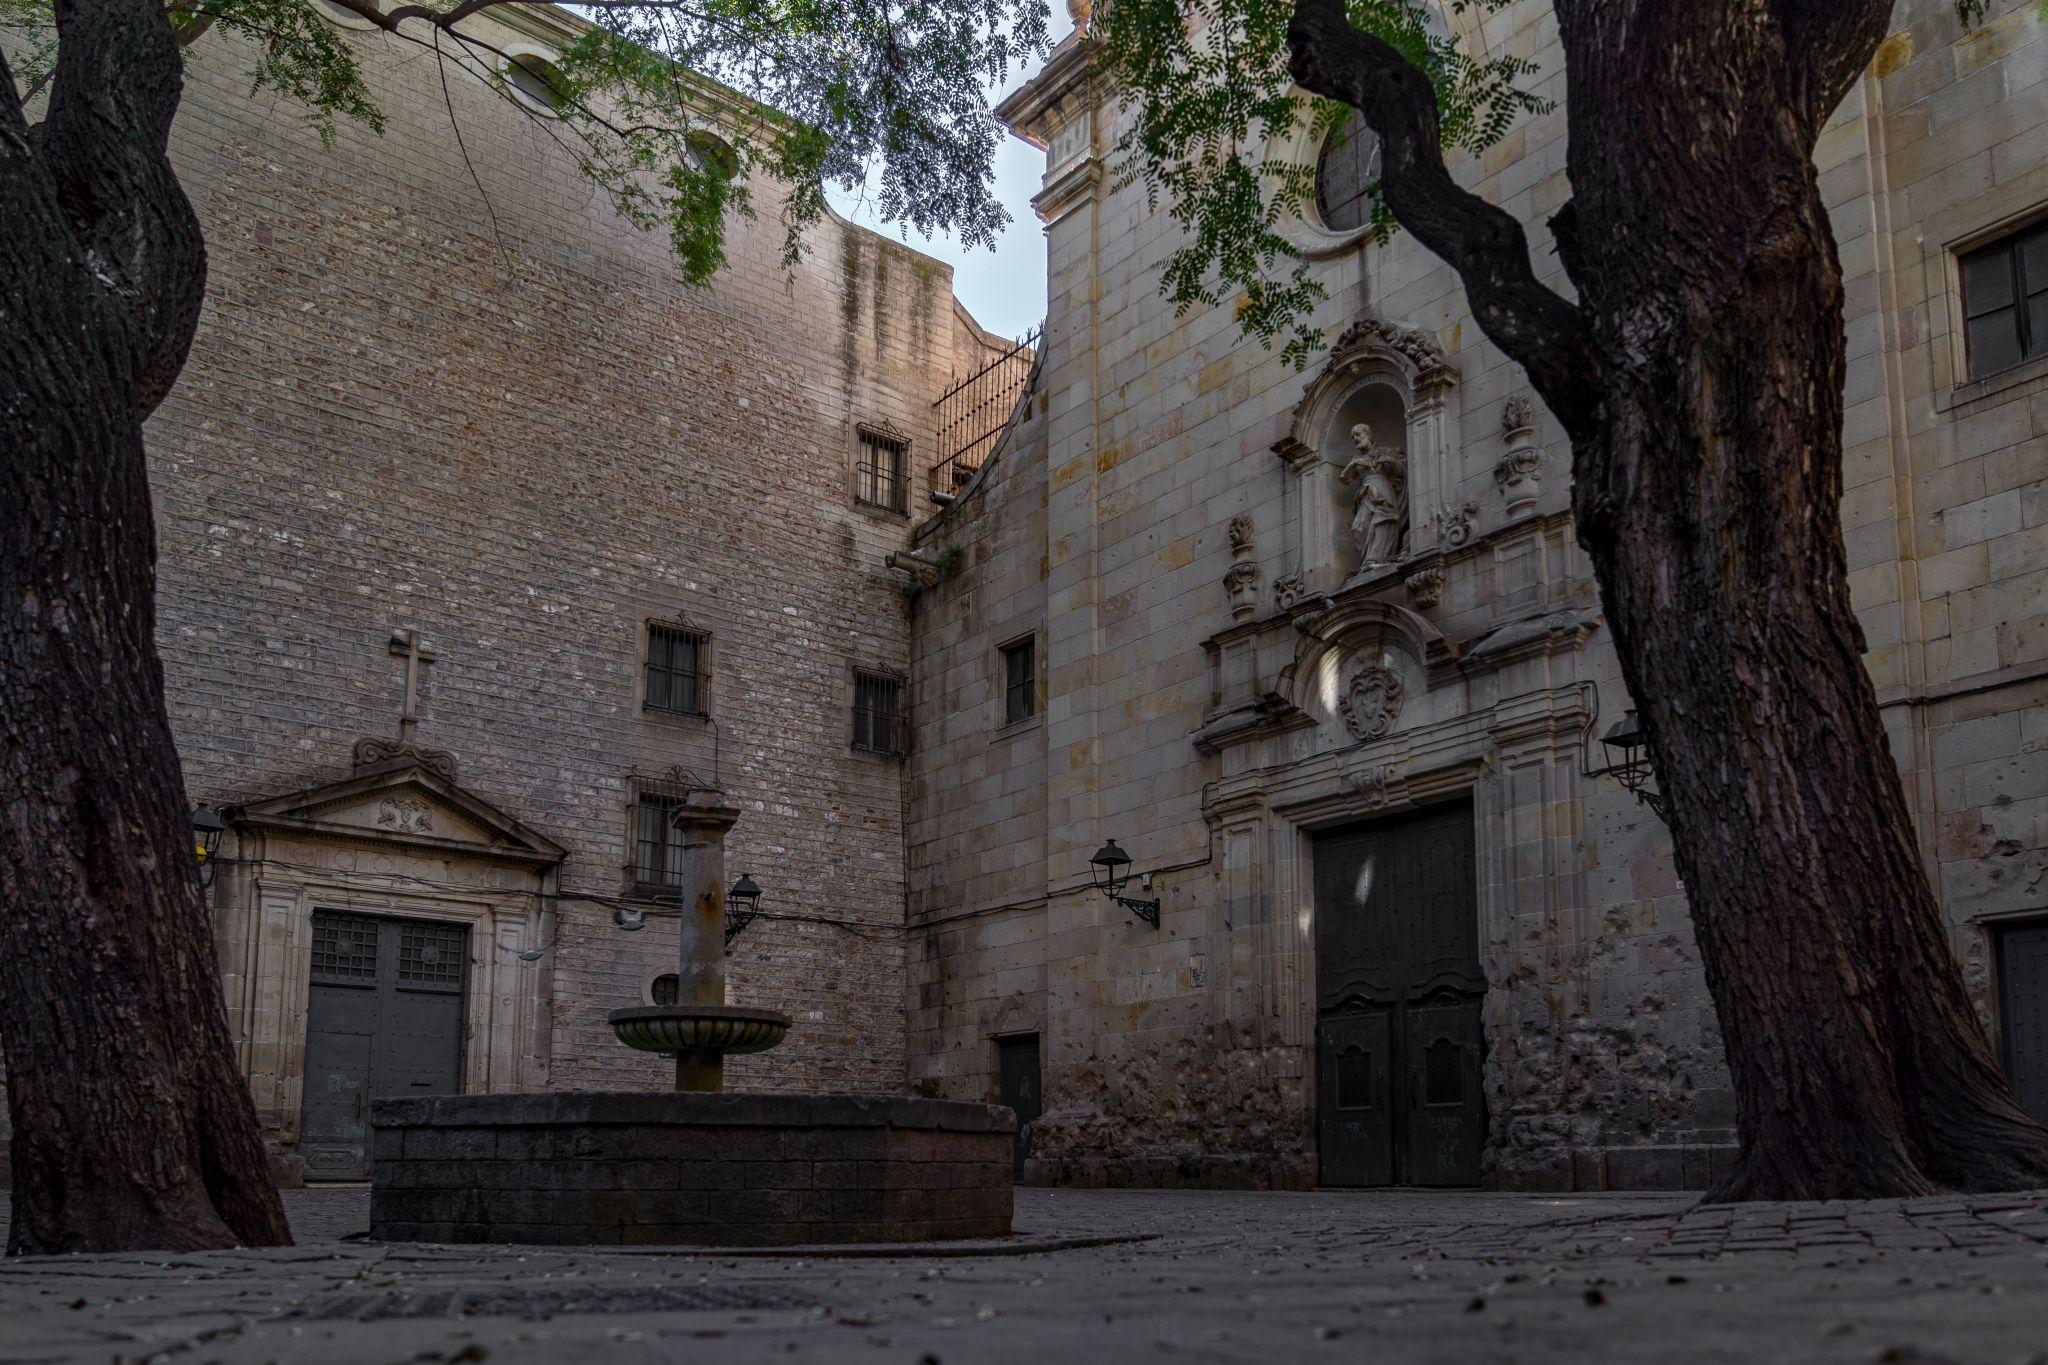 Plaza de San Felipe Neri, Barcelona, Spain